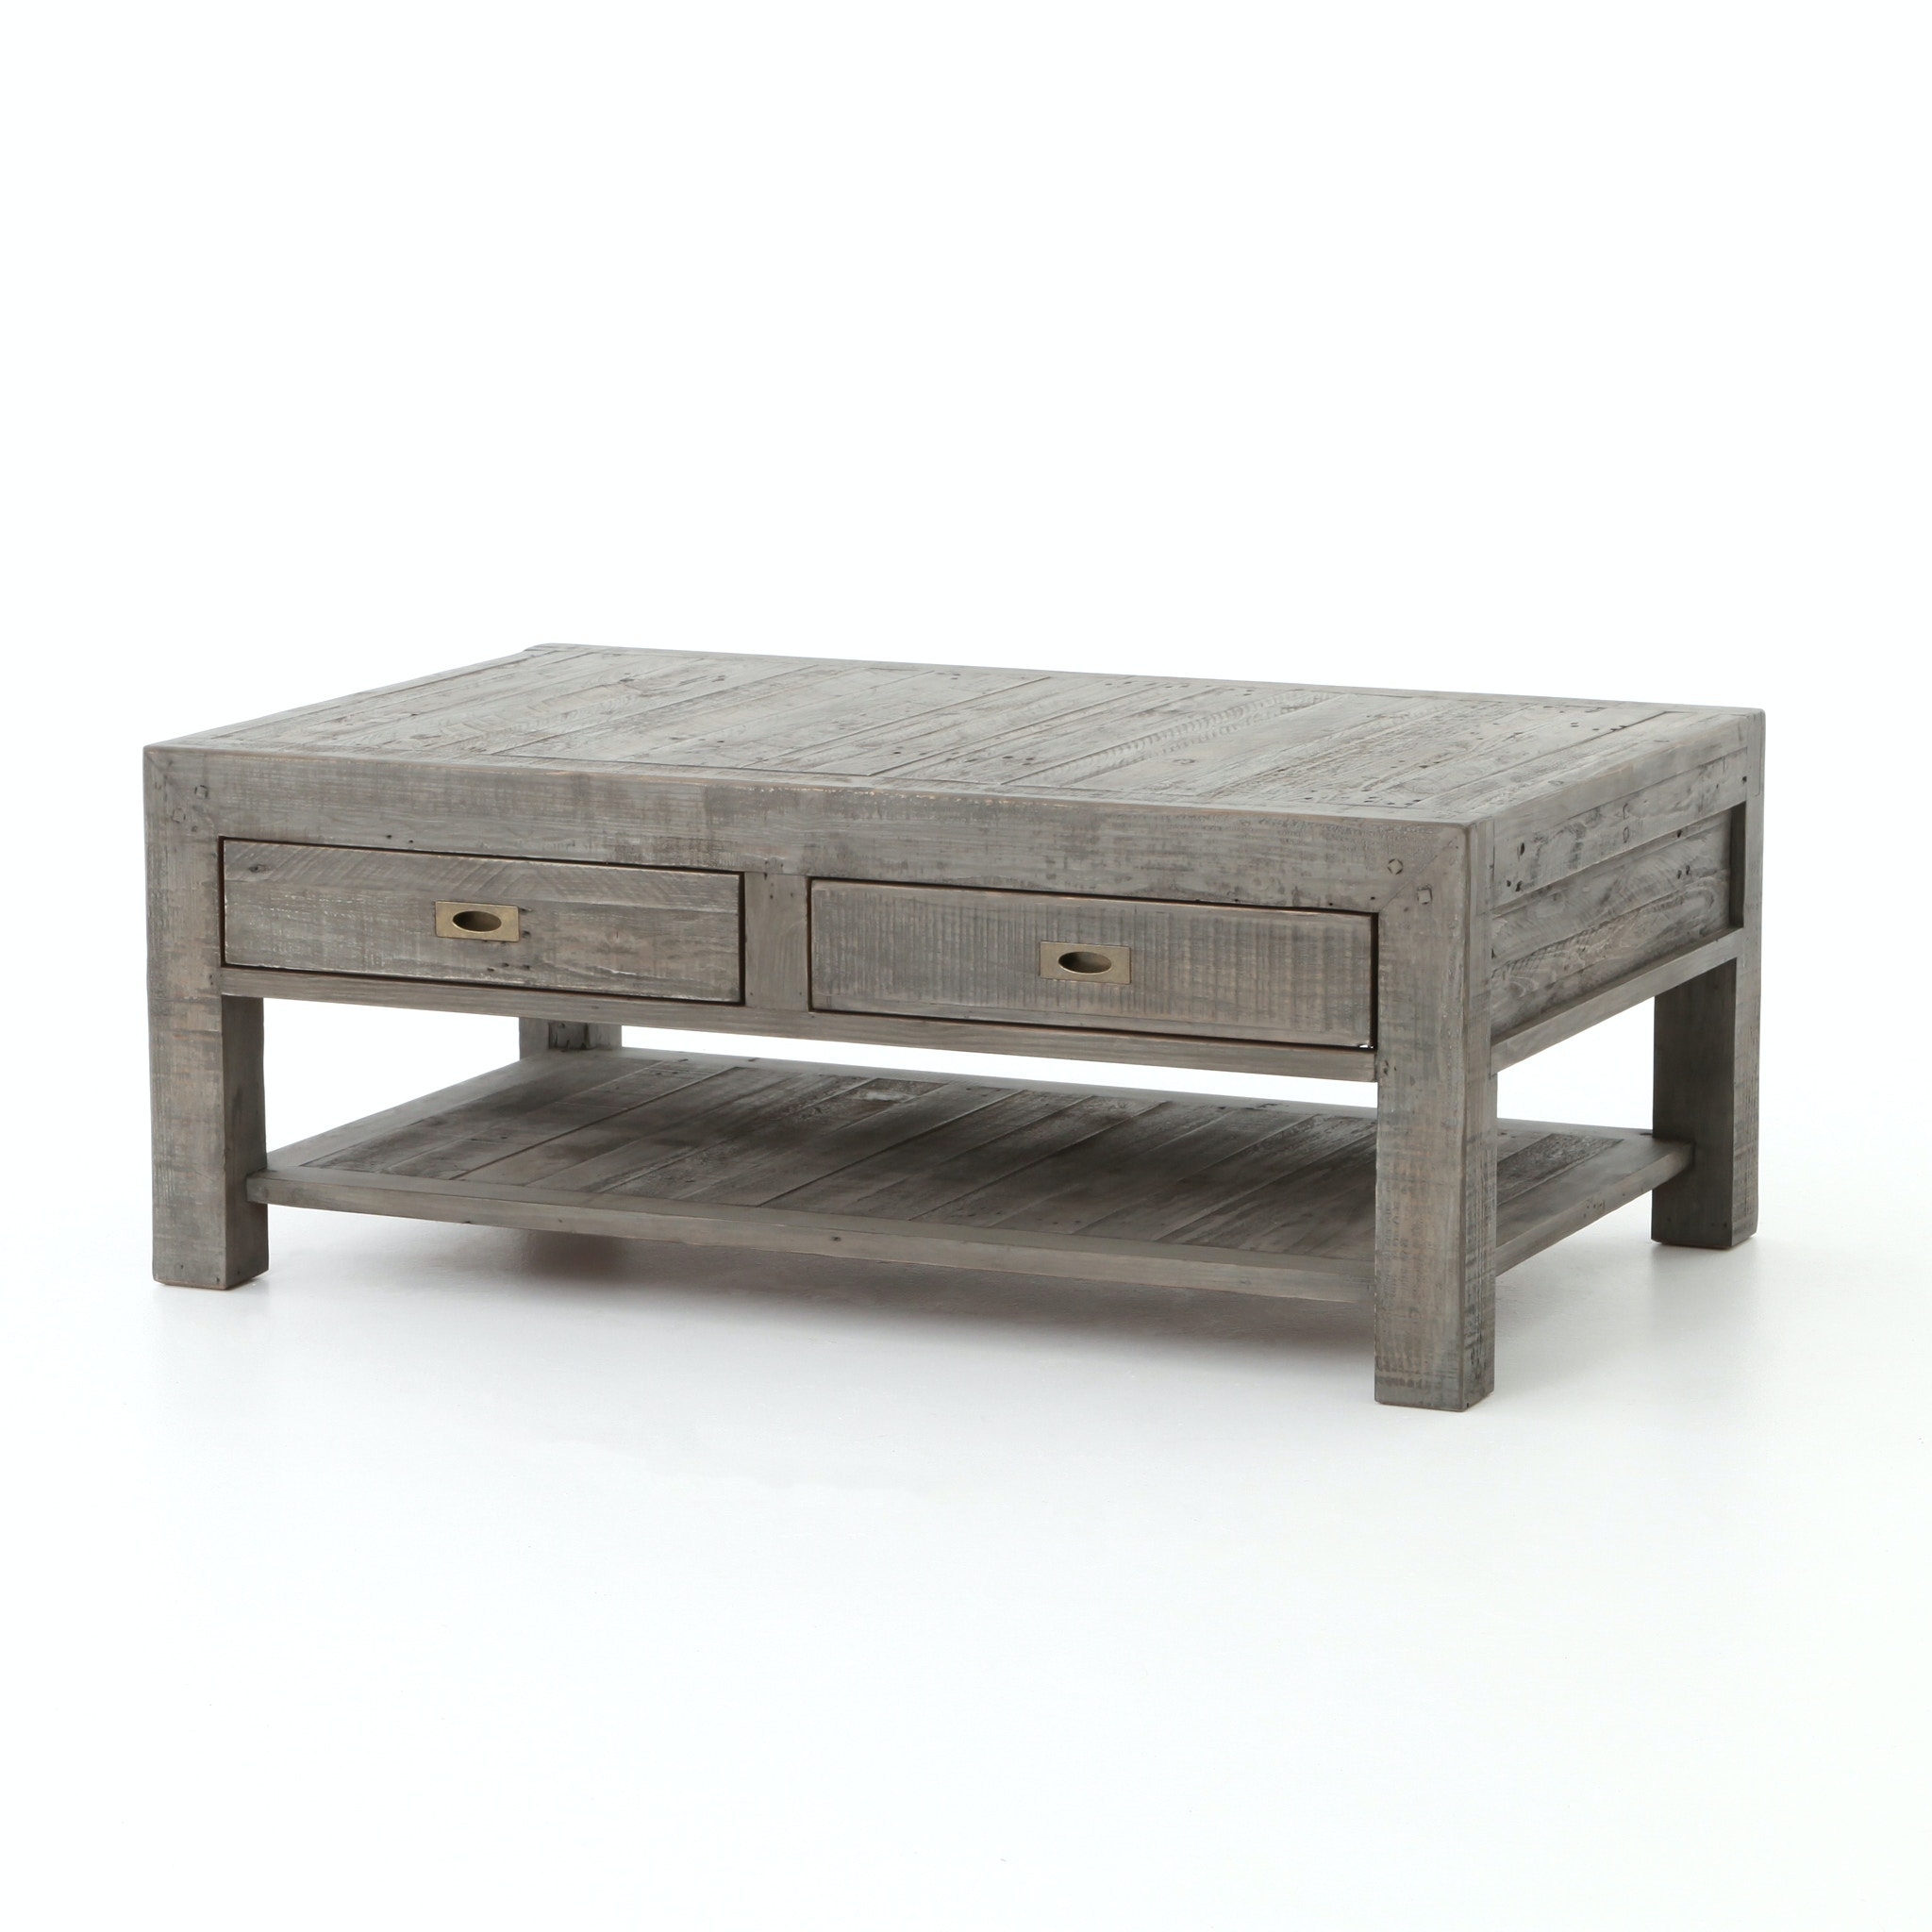 Four Hands Furniture Post U0026 Rail Coffee Table 50u0027u0027 Black Oliv ...